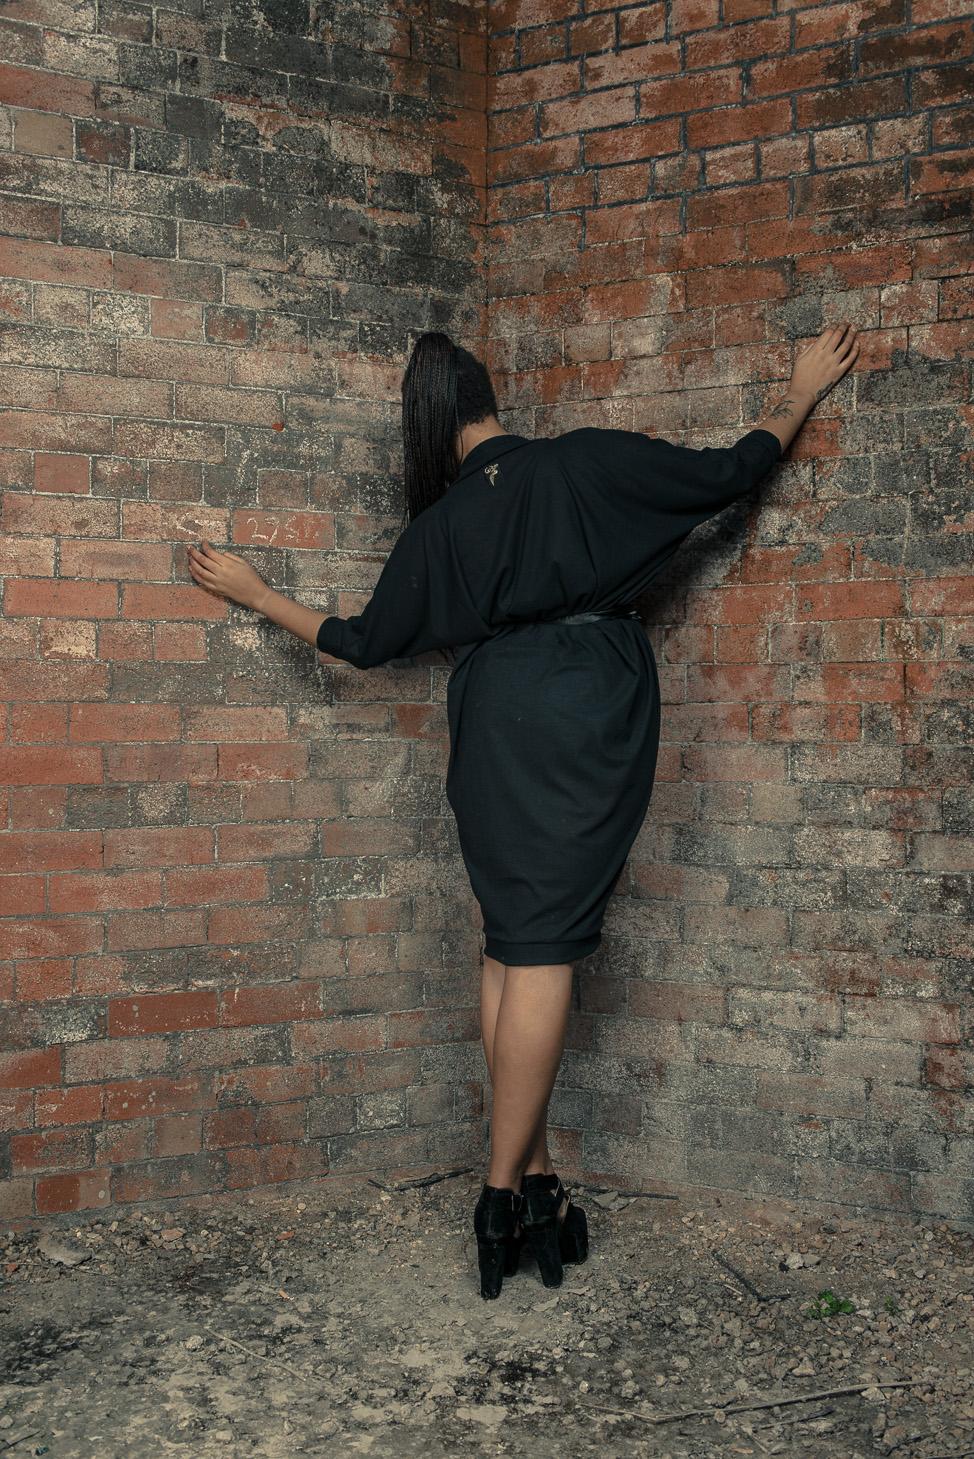 zaramia-ava-zaramiaava-leeds-fashion-designer-ethical-sustainable-tailored-minimalist-aya-dress-versatile-drape-black-belt-wrap-cowl-styling-womenswear-models-photoshoot-location-16